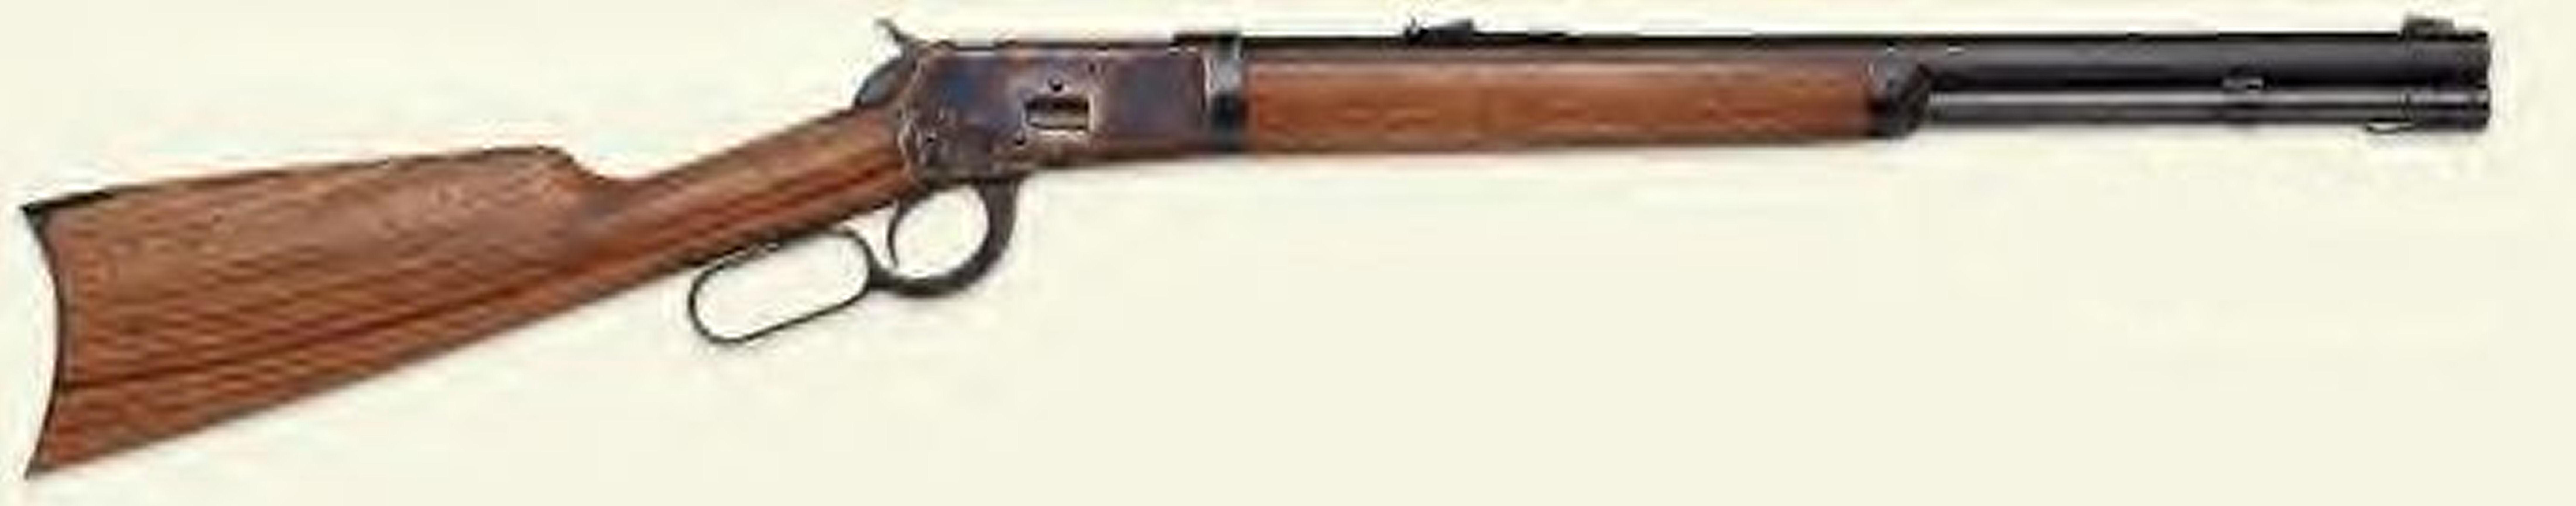 Drawn shotgun cowboy gun Shooter by New Winchester Cowboy